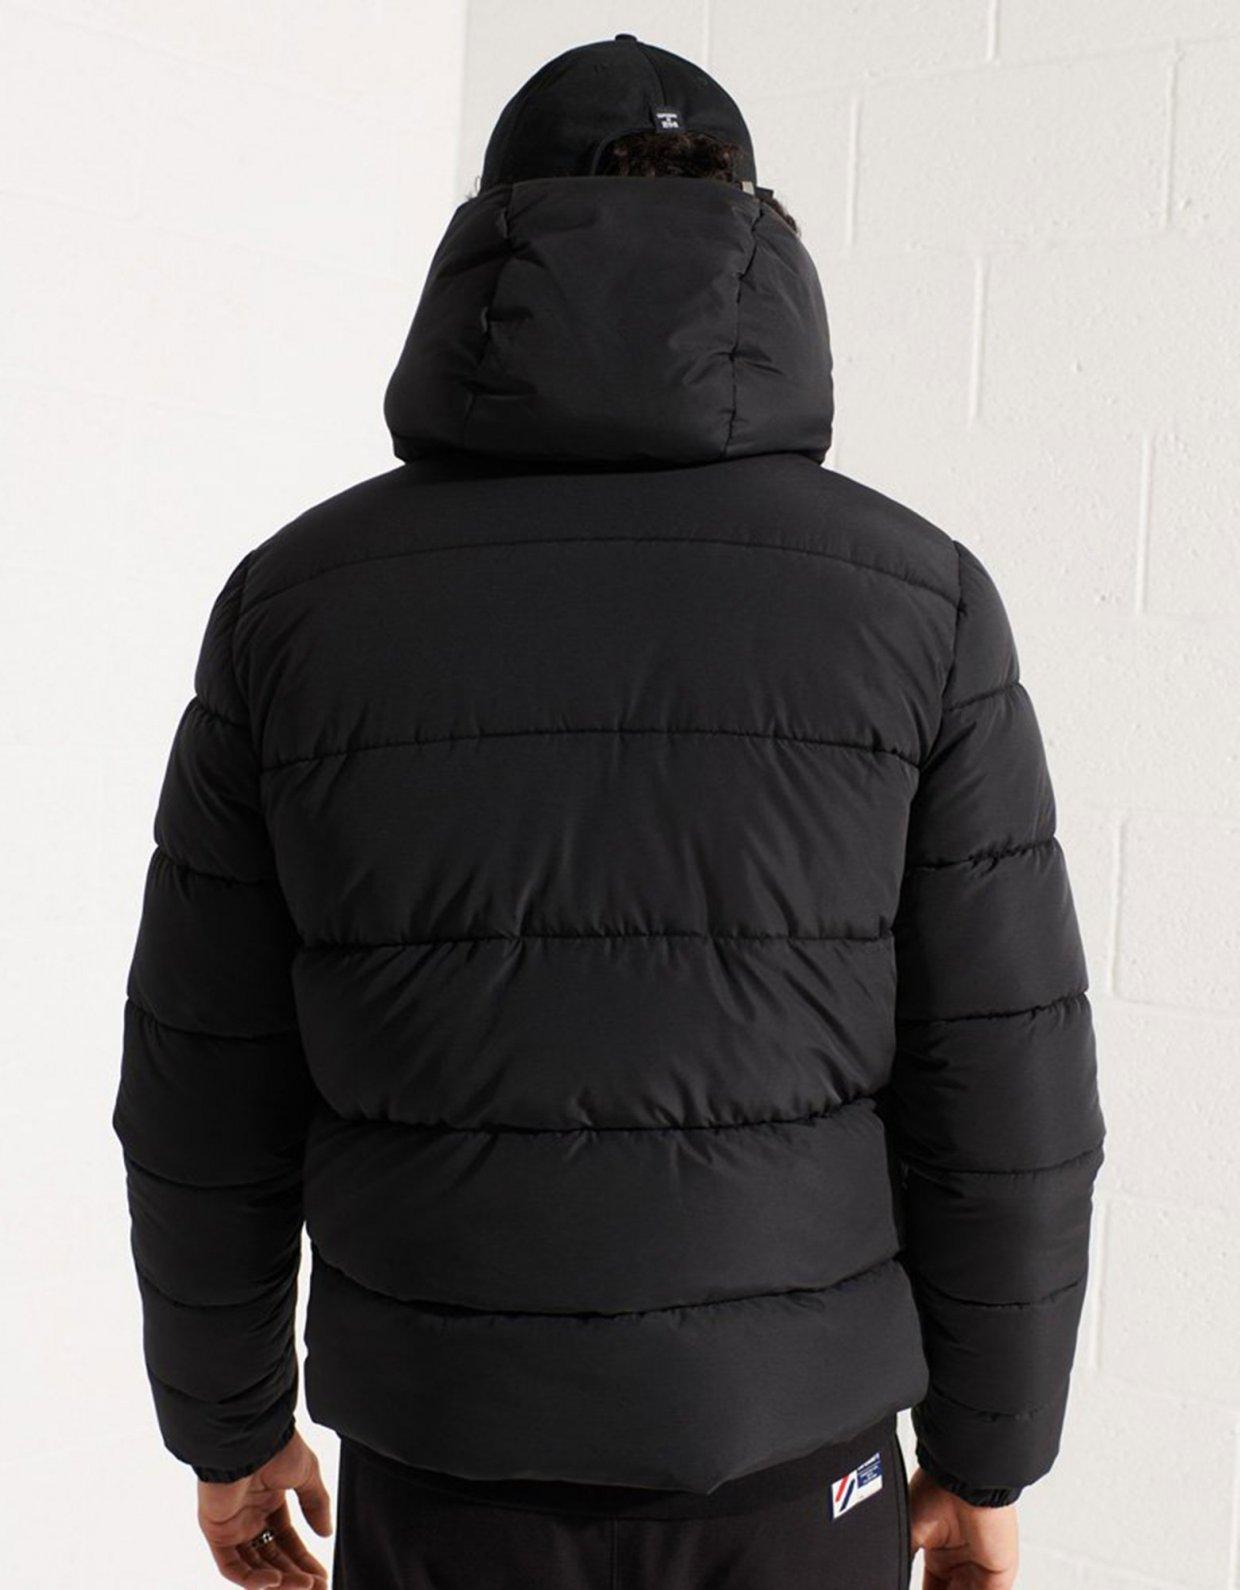 Superdry Hooded sports puffer jacket black